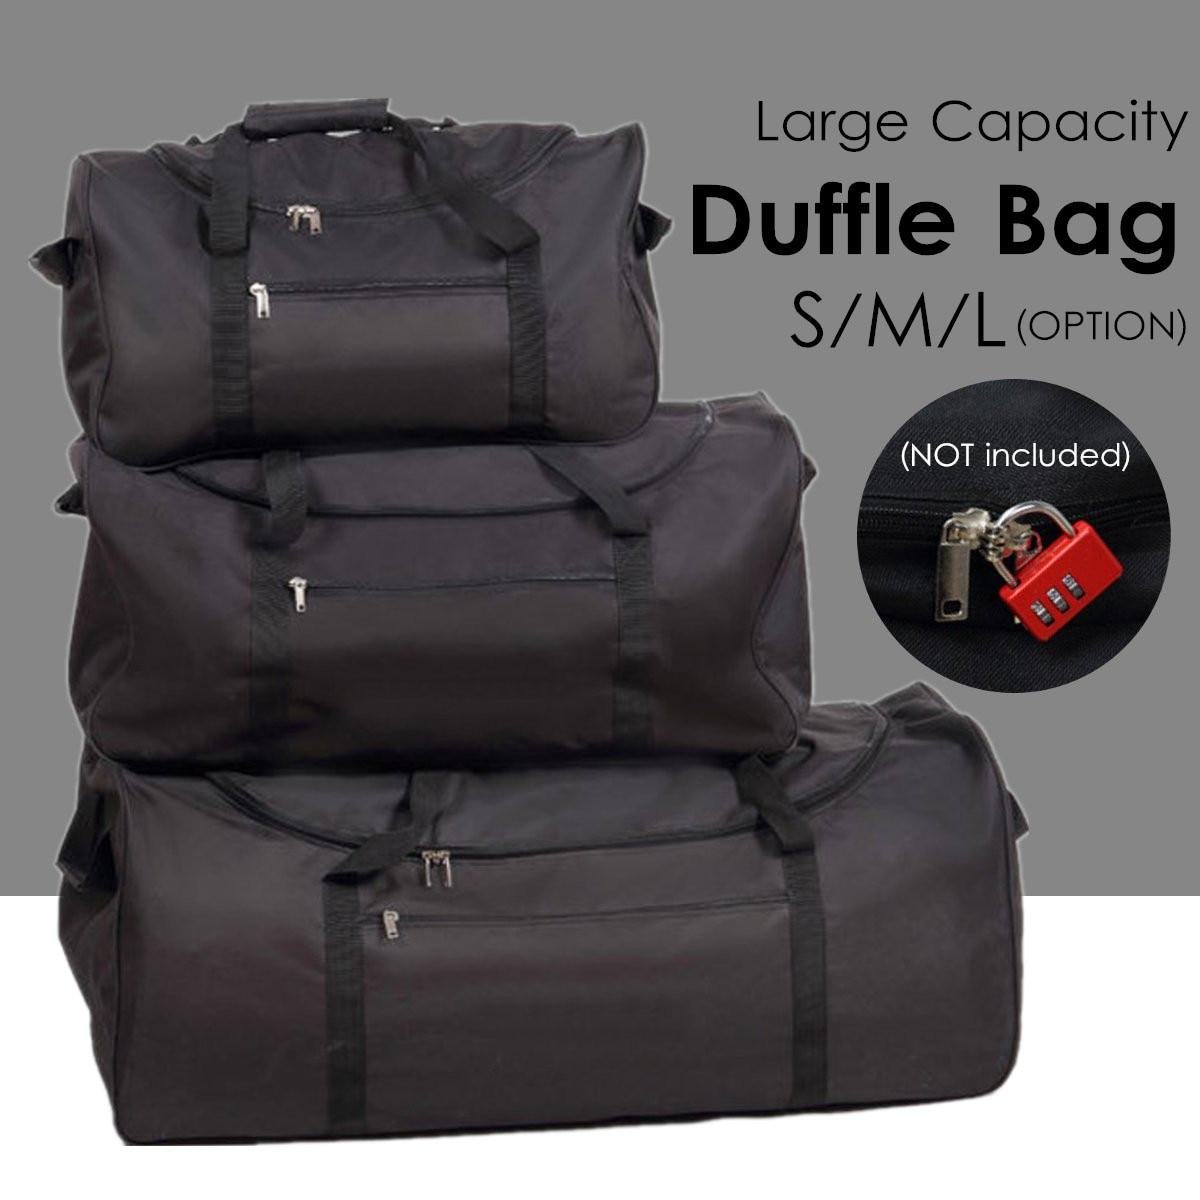 Galaxy Rainbow Star Unicorn Purple Travel Lightweight Waterproof Foldable Storage Carry Luggage Duffle Tote Bag